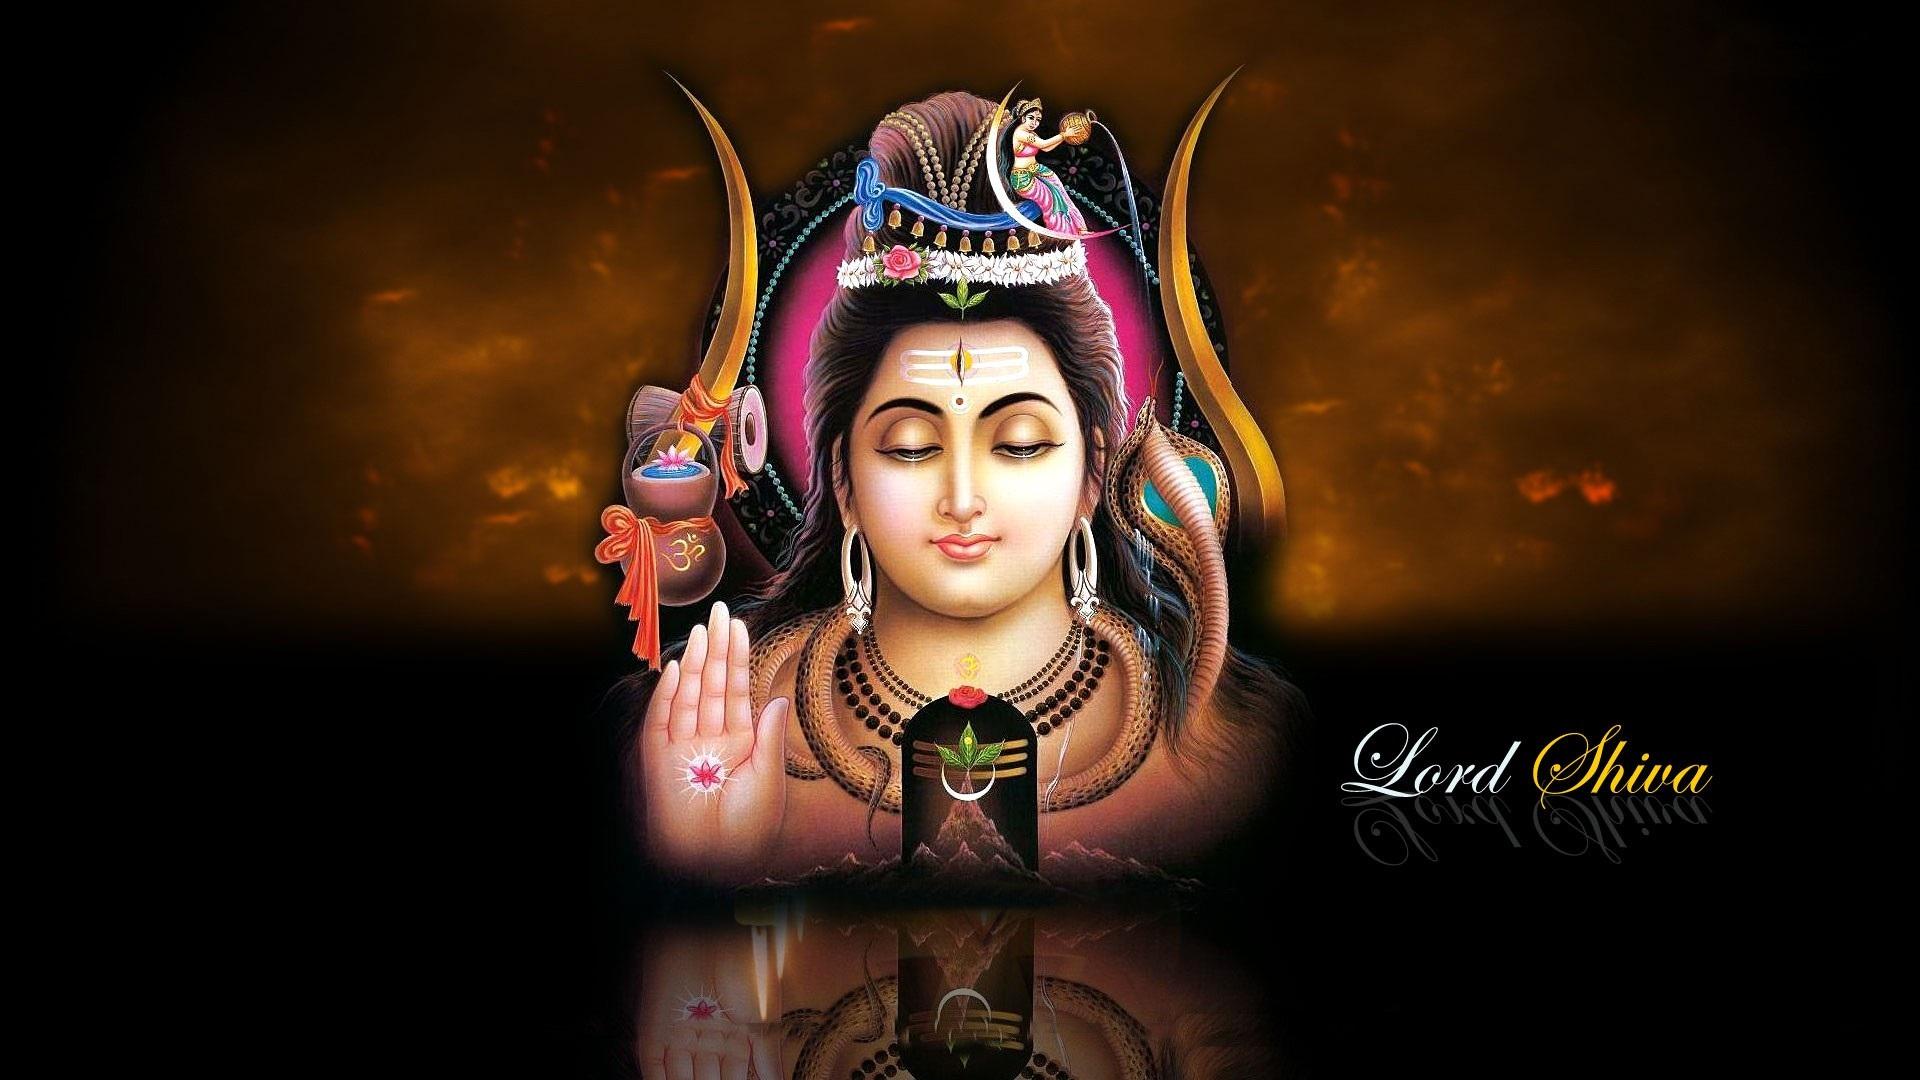 Hd wallpaper bholenath - Lord Shiva With Shivling 2014 Hd Wallpaper Hd Wallpapers Rocks